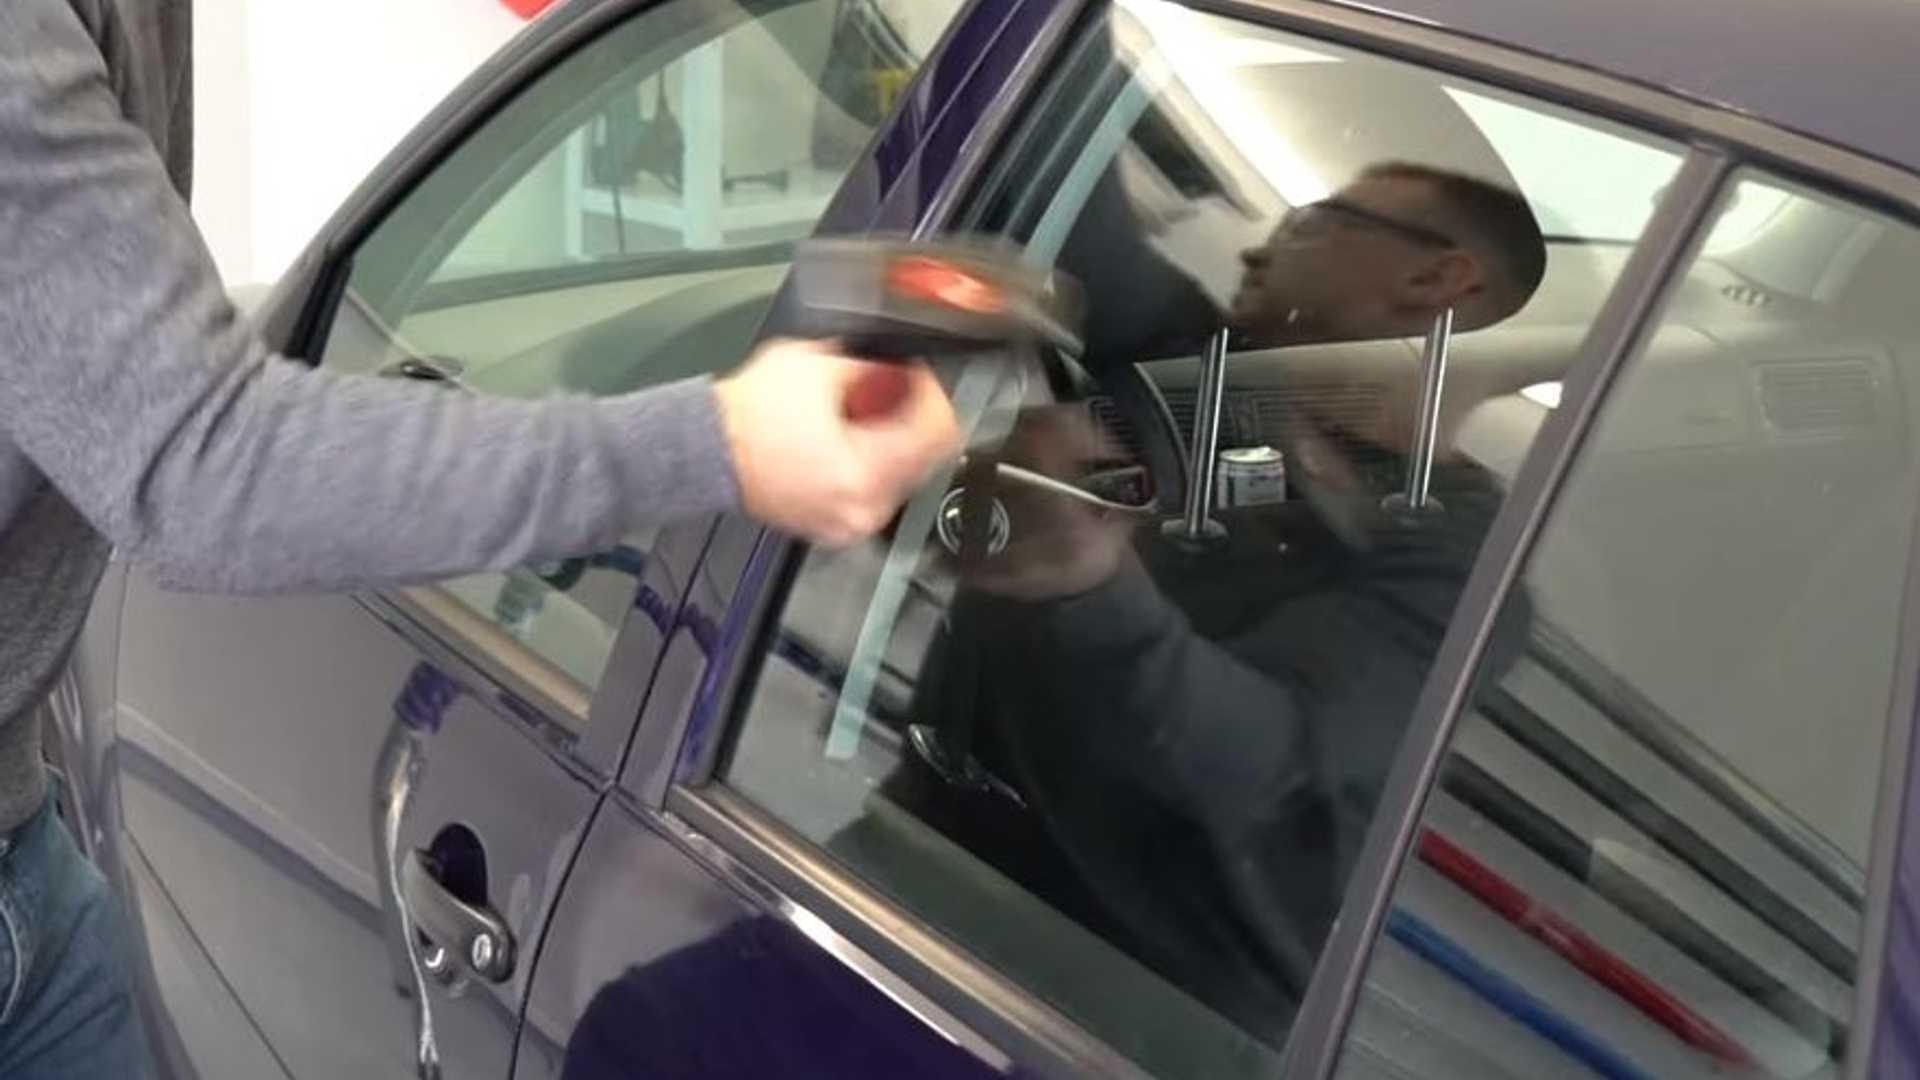 VW Golf Glass Tests